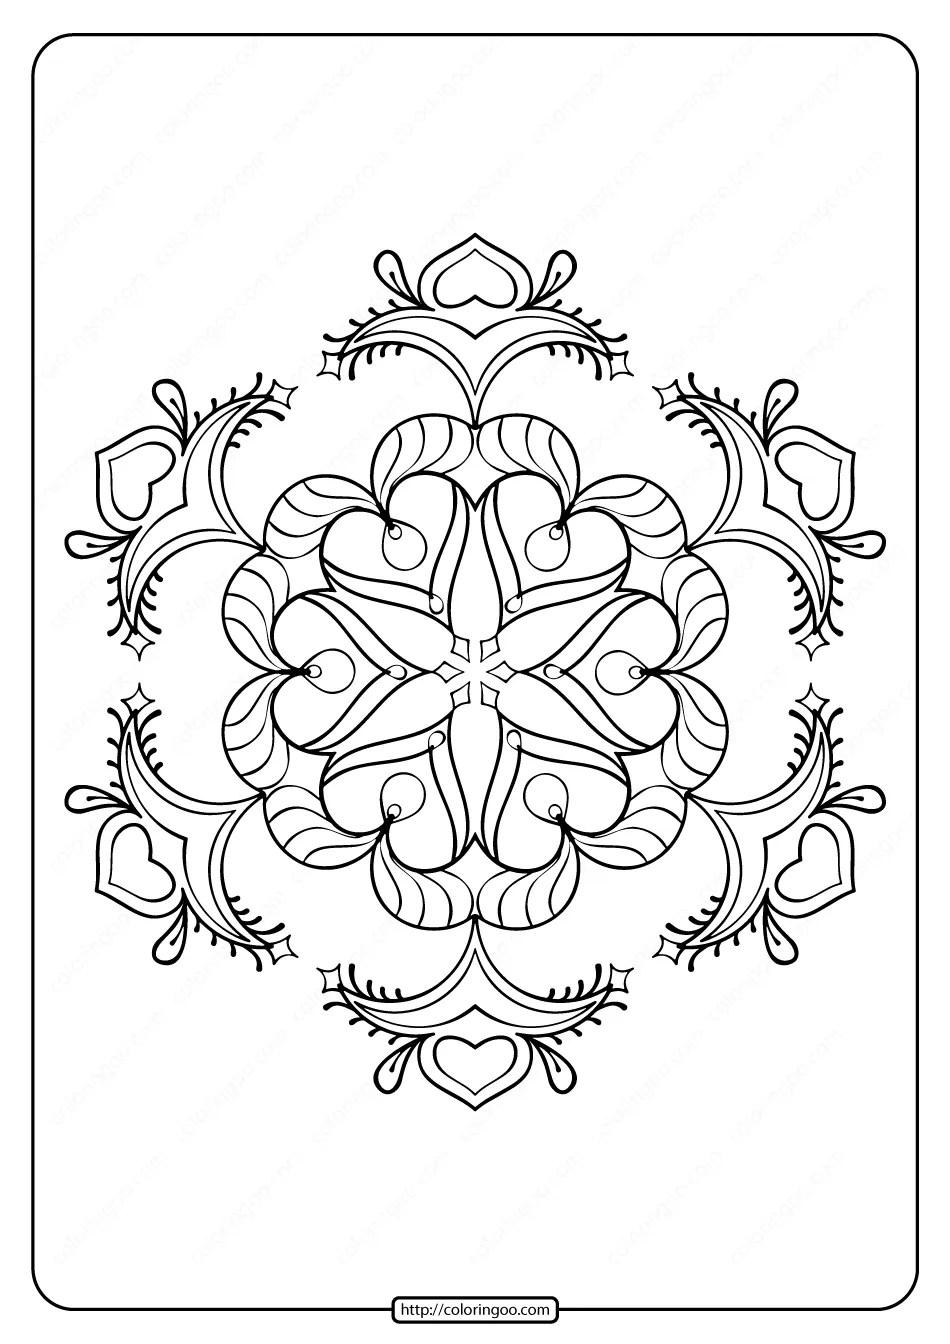 Free Printable Snowflake Pdf Coloring Page 04